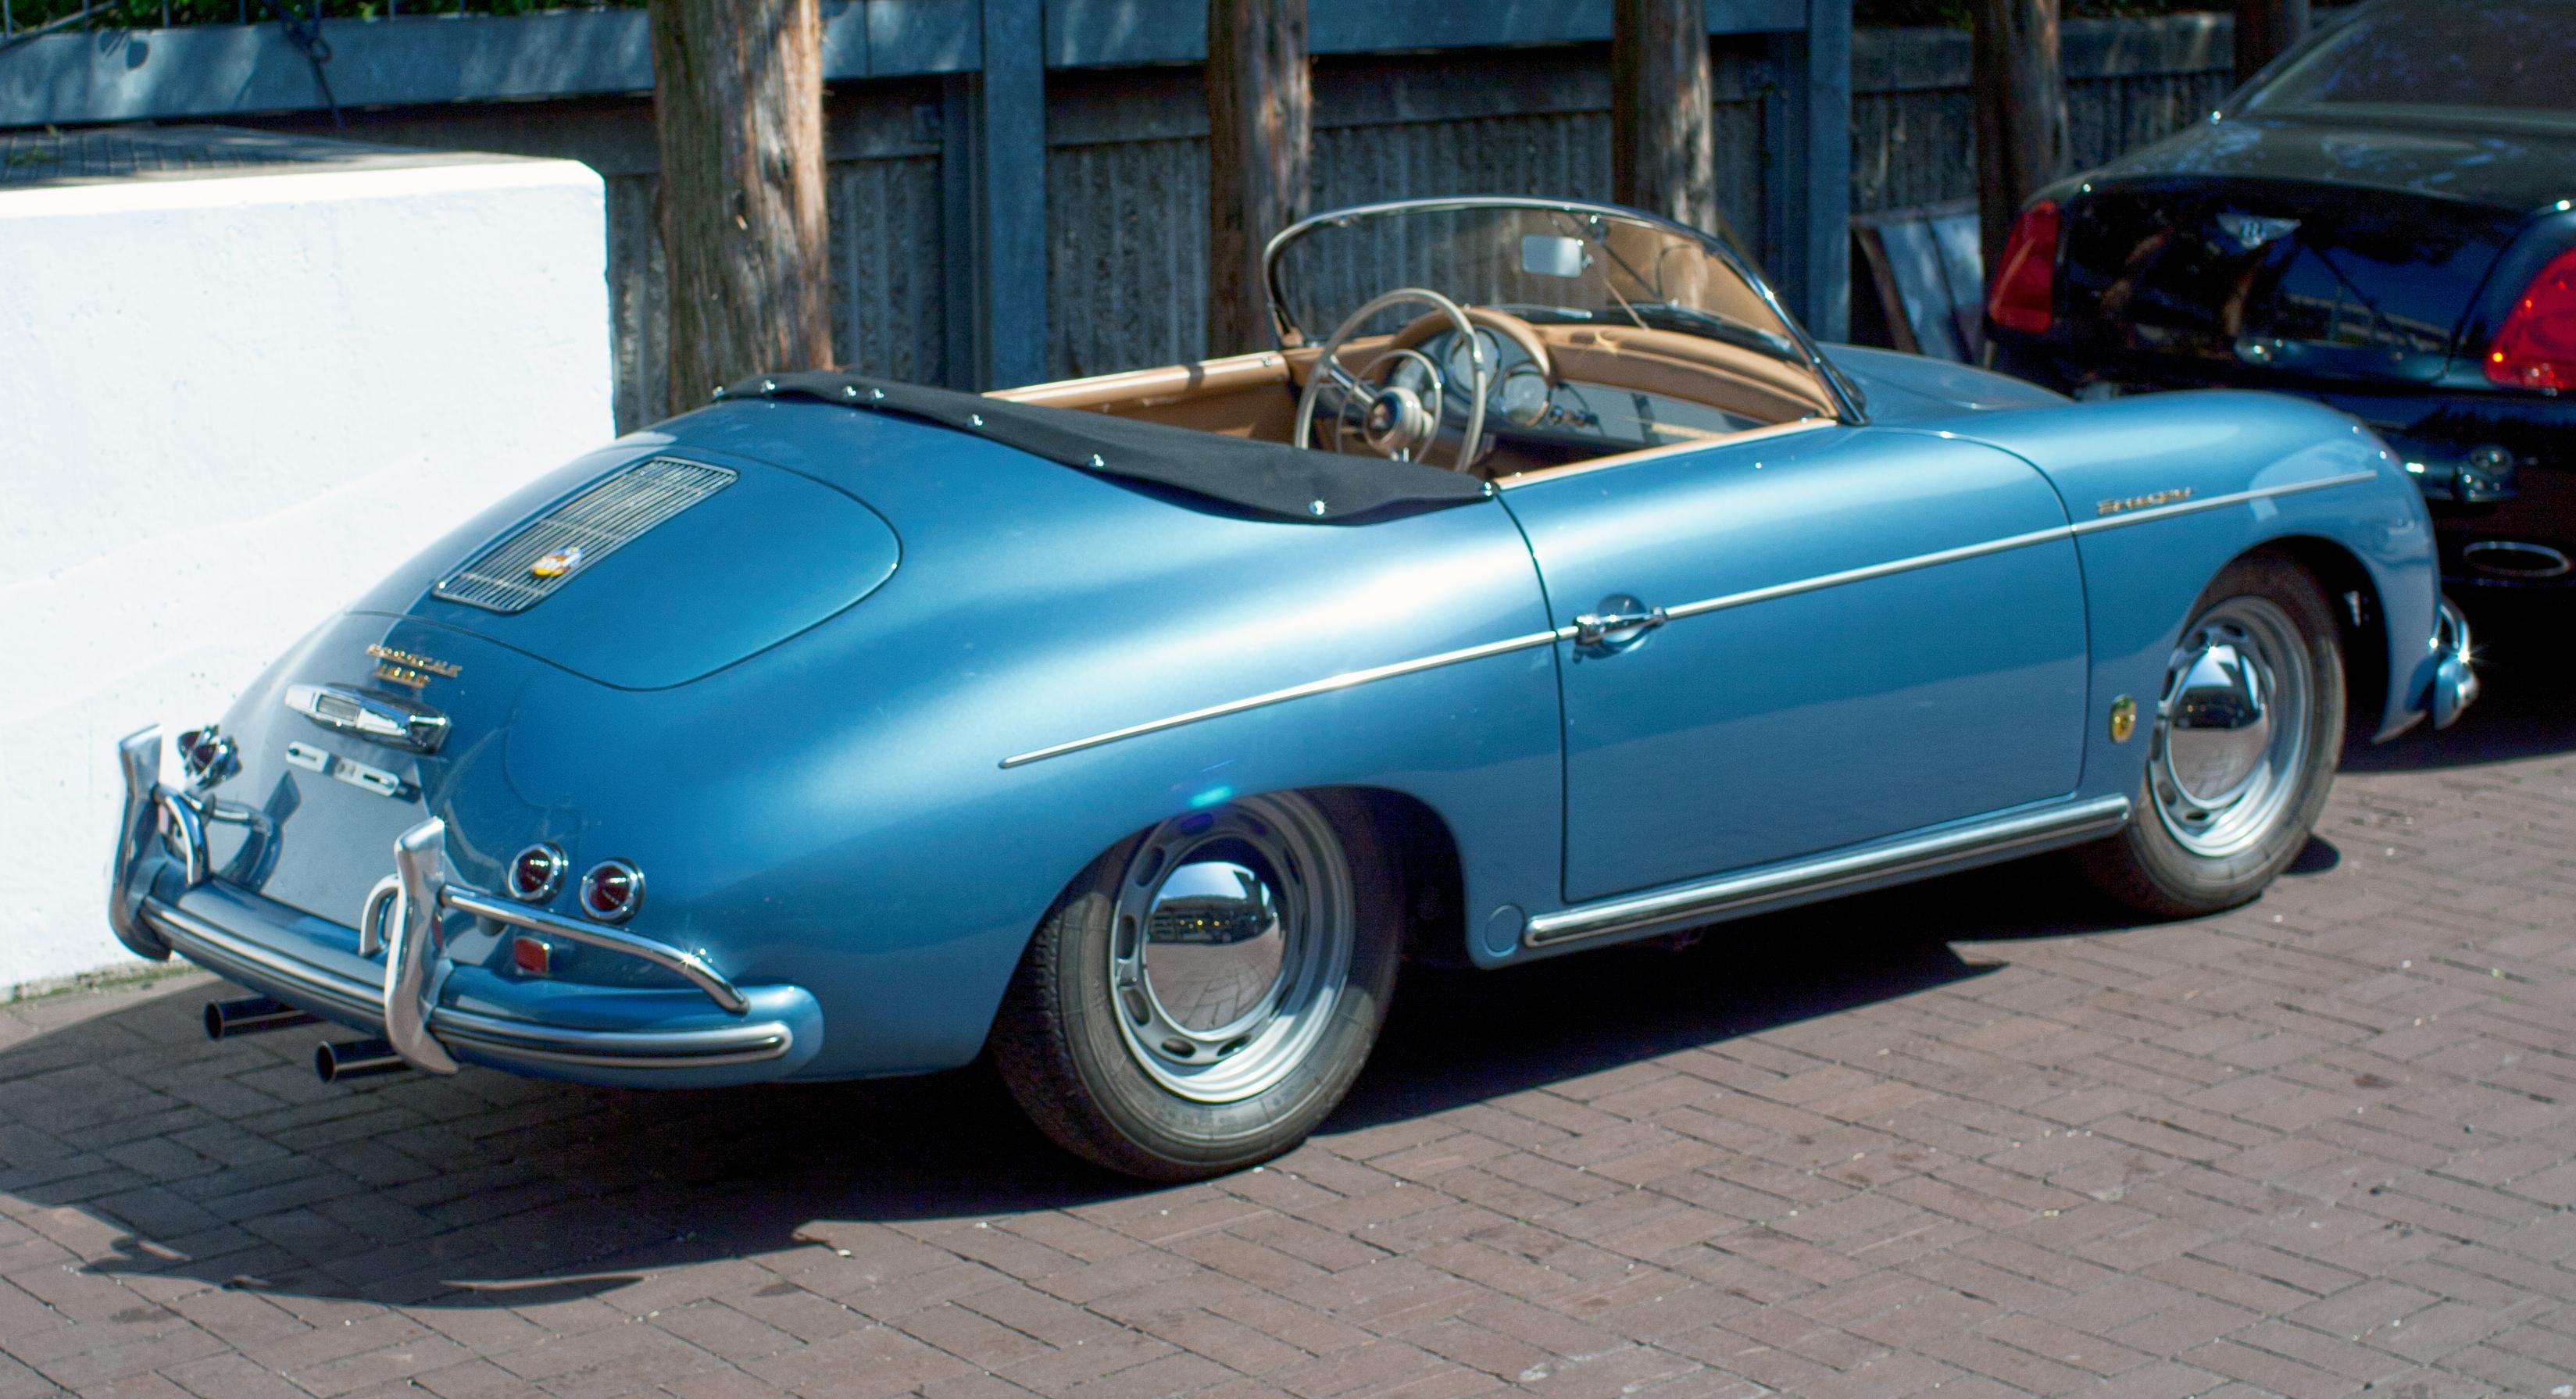 file 1957 porsche 356 speedster a wikimedia commons. Black Bedroom Furniture Sets. Home Design Ideas